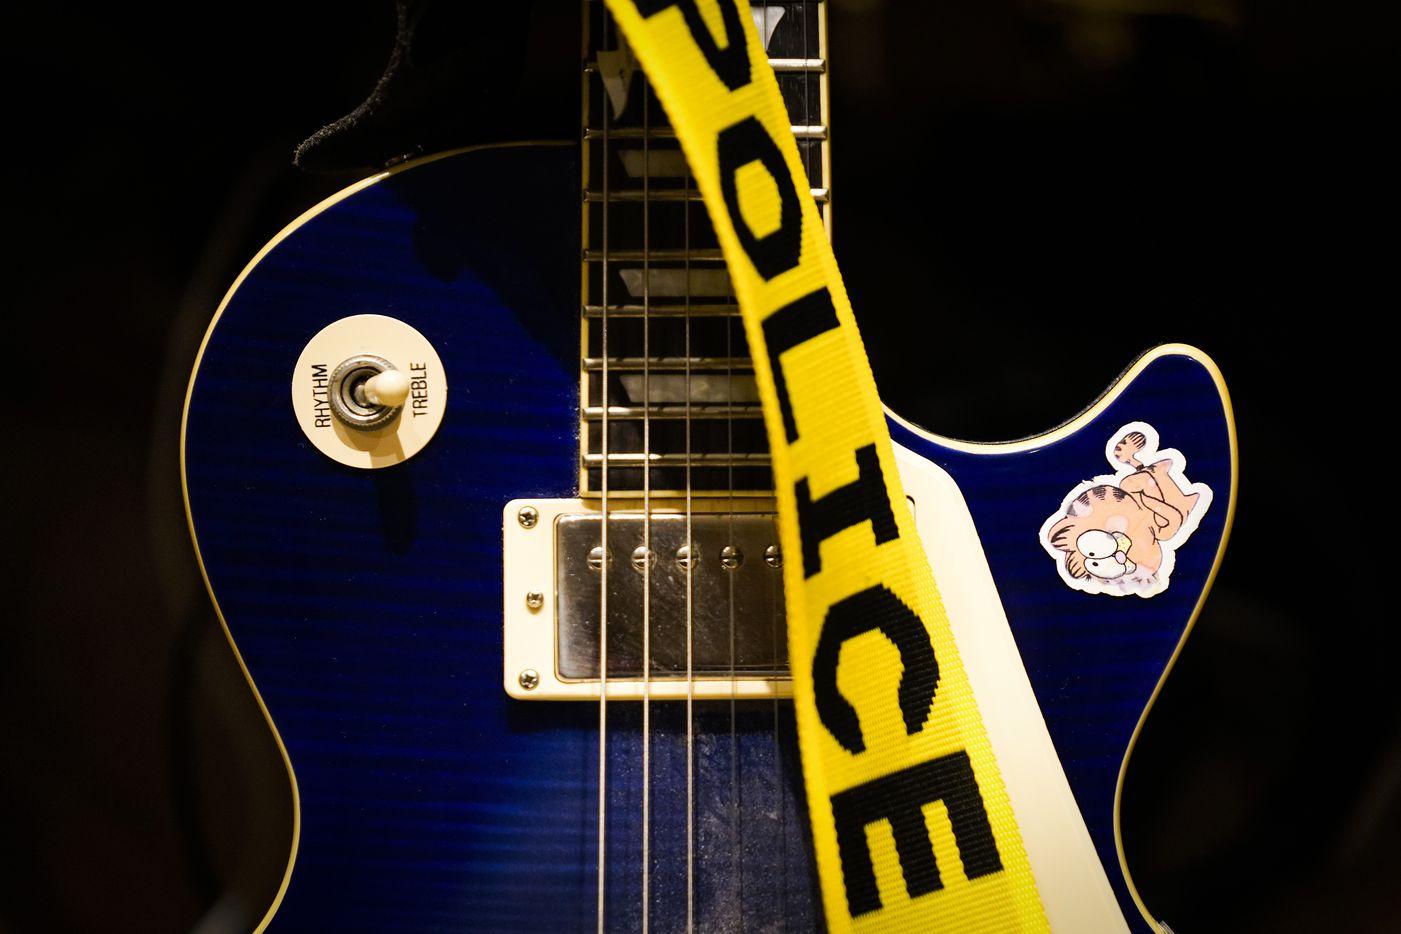 A Garfield sticker is seen on Korbin Bilbrey's electric guitar on Thursday, June 17, 2021, in Dallas.